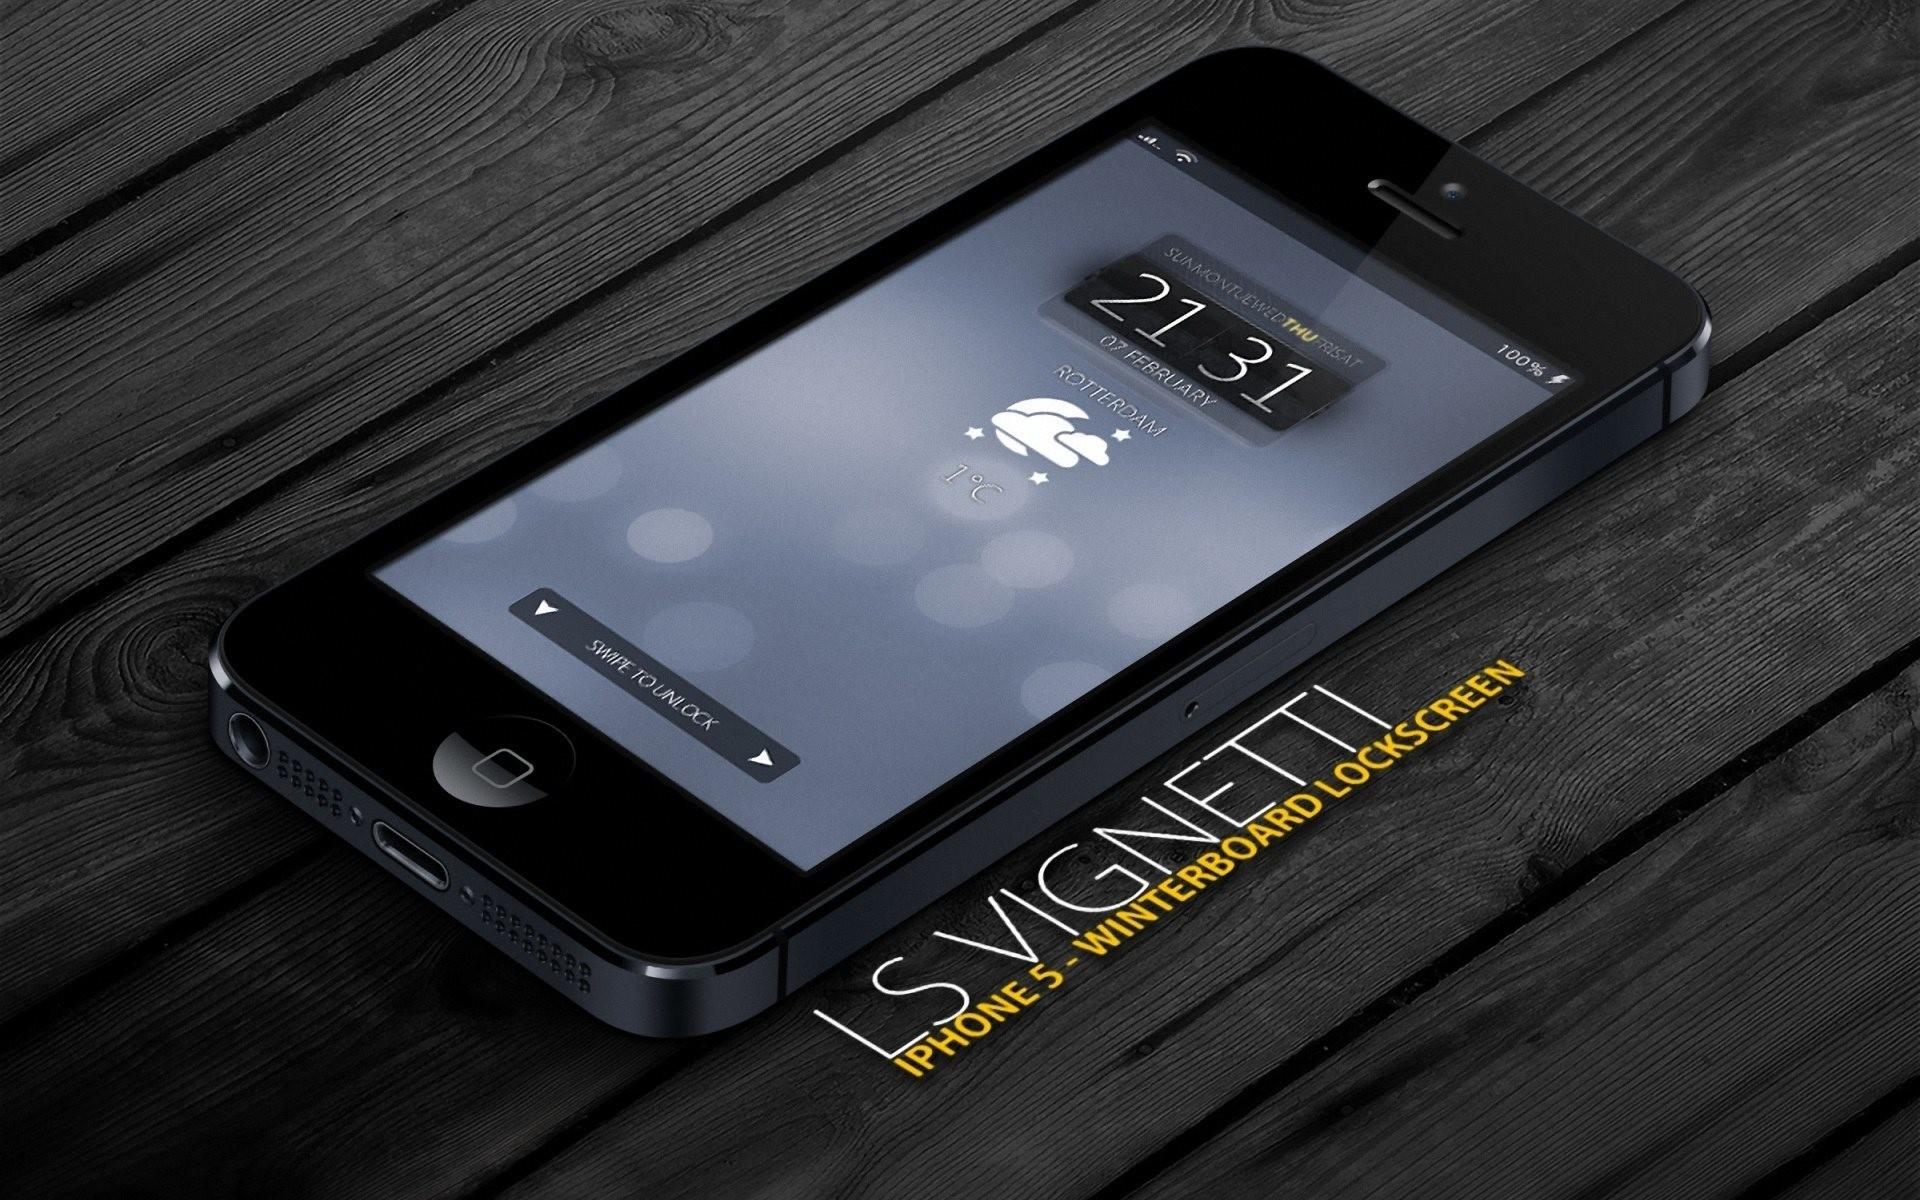 Iphone 4s Lock Screen Wallpaper 64 Images